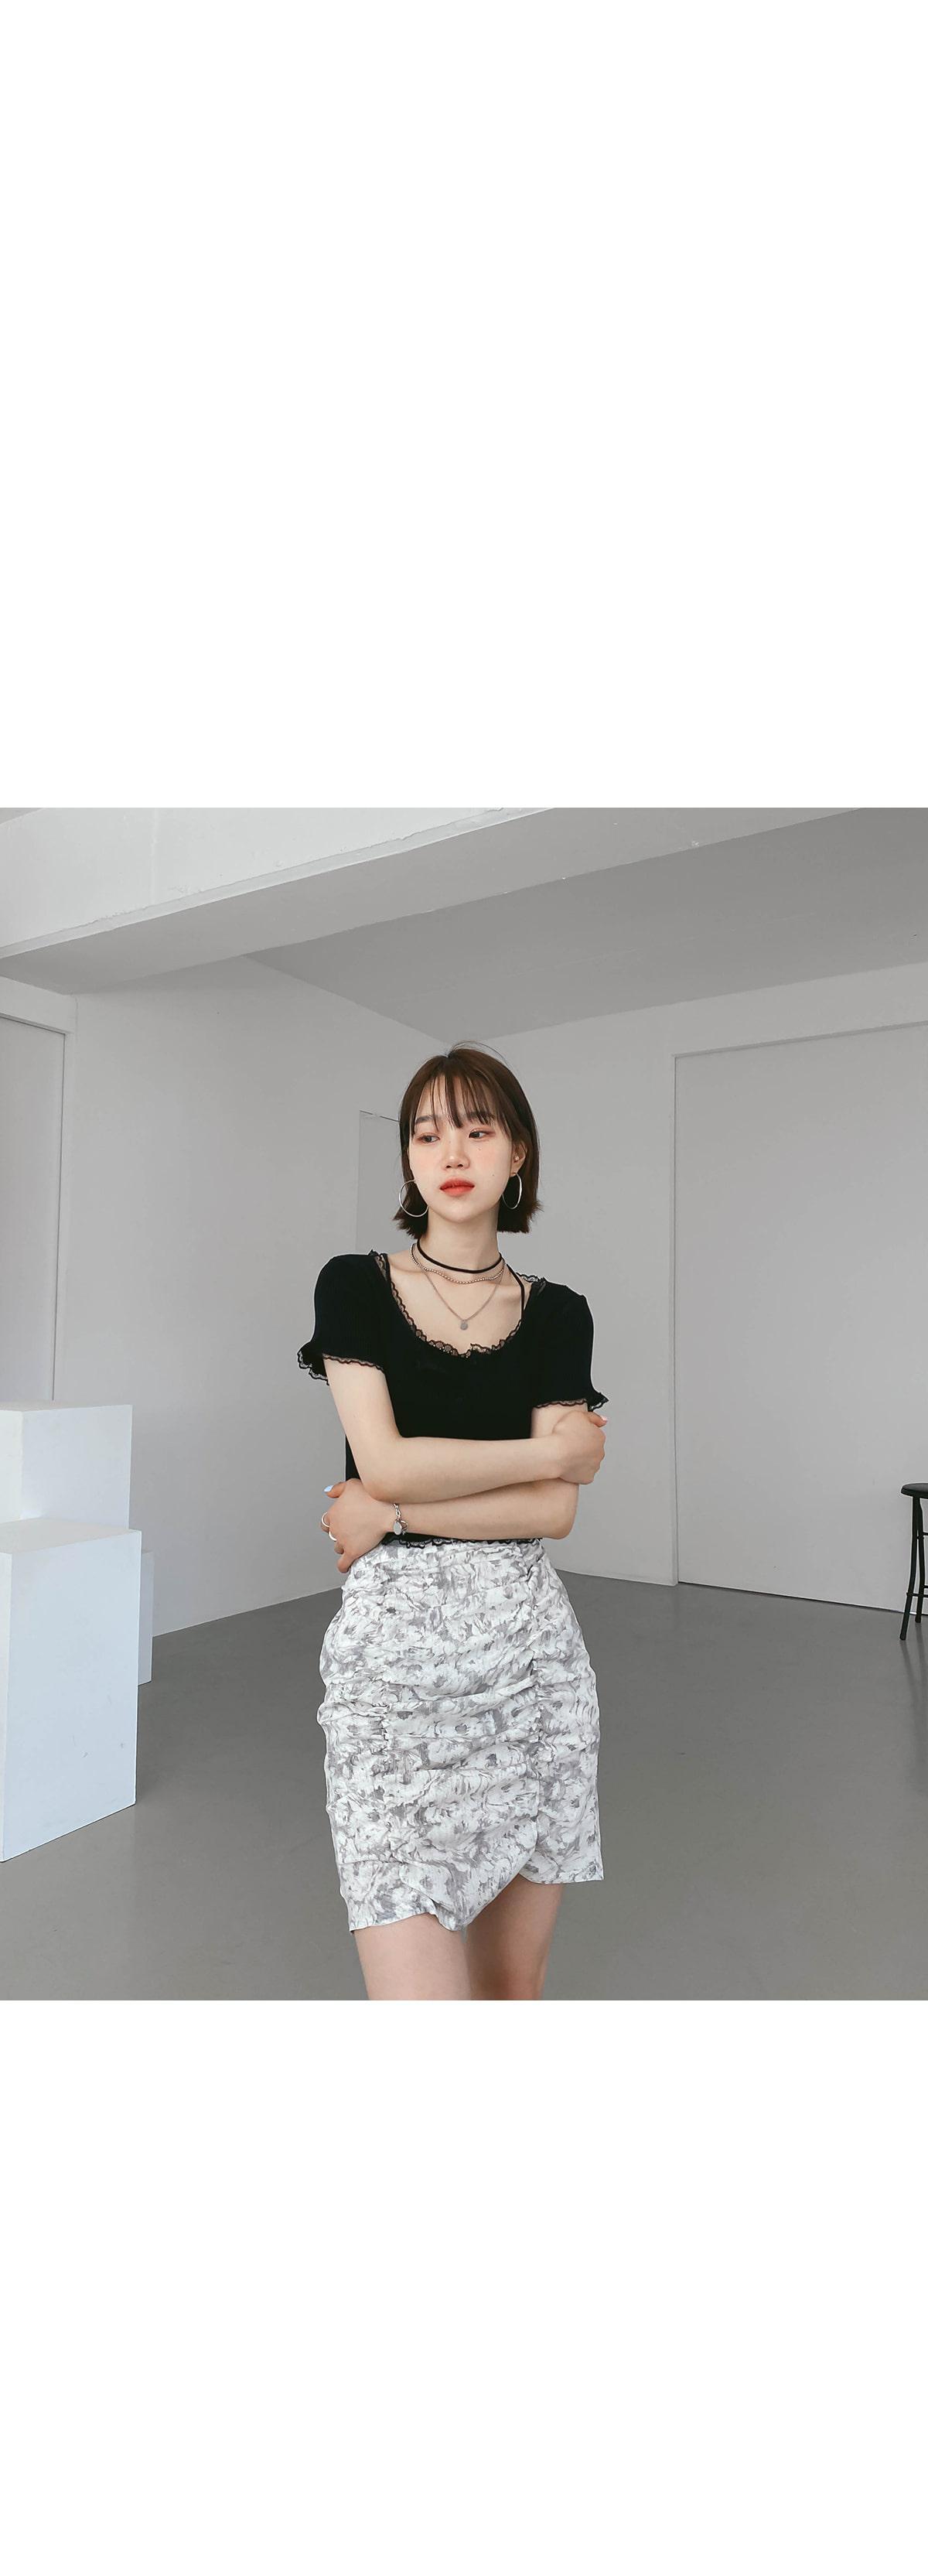 Tie-dye city mini skirt